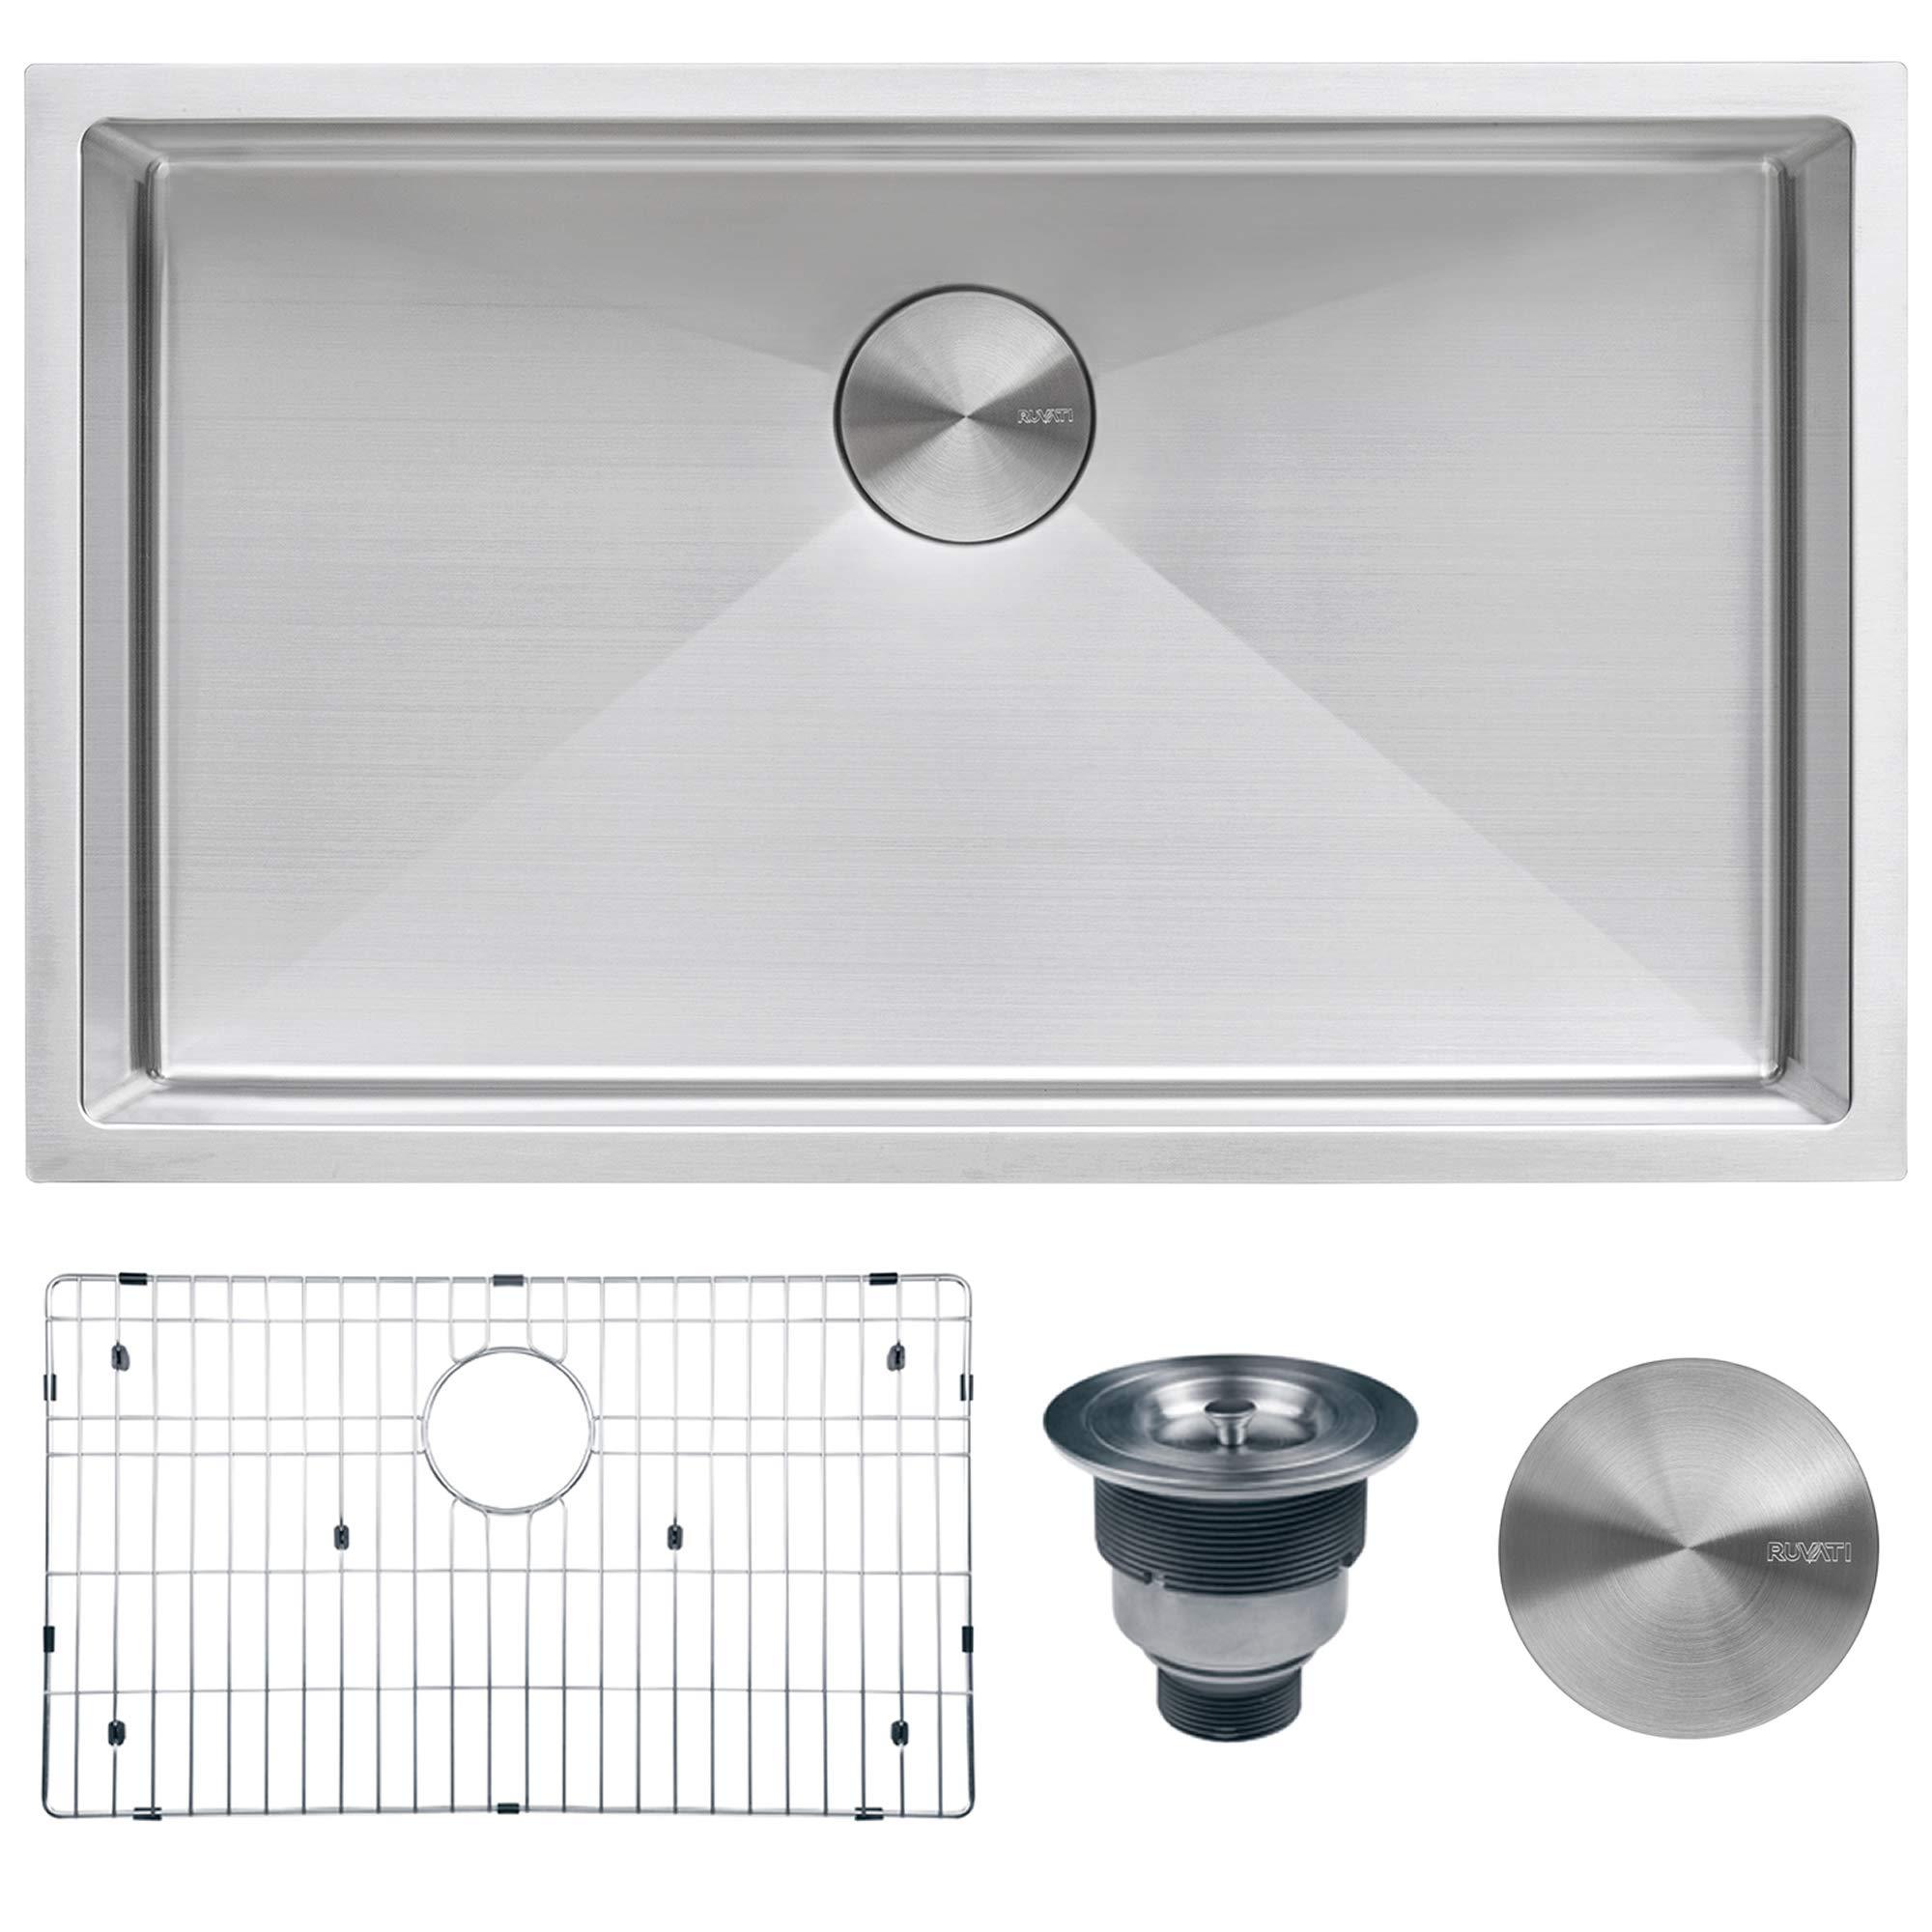 Ruvati 32-inch Undermount 16 Gauge Tight Radius Kitchen Sink Stainless Steel Single Bowl - RVH7400 by Ruvati